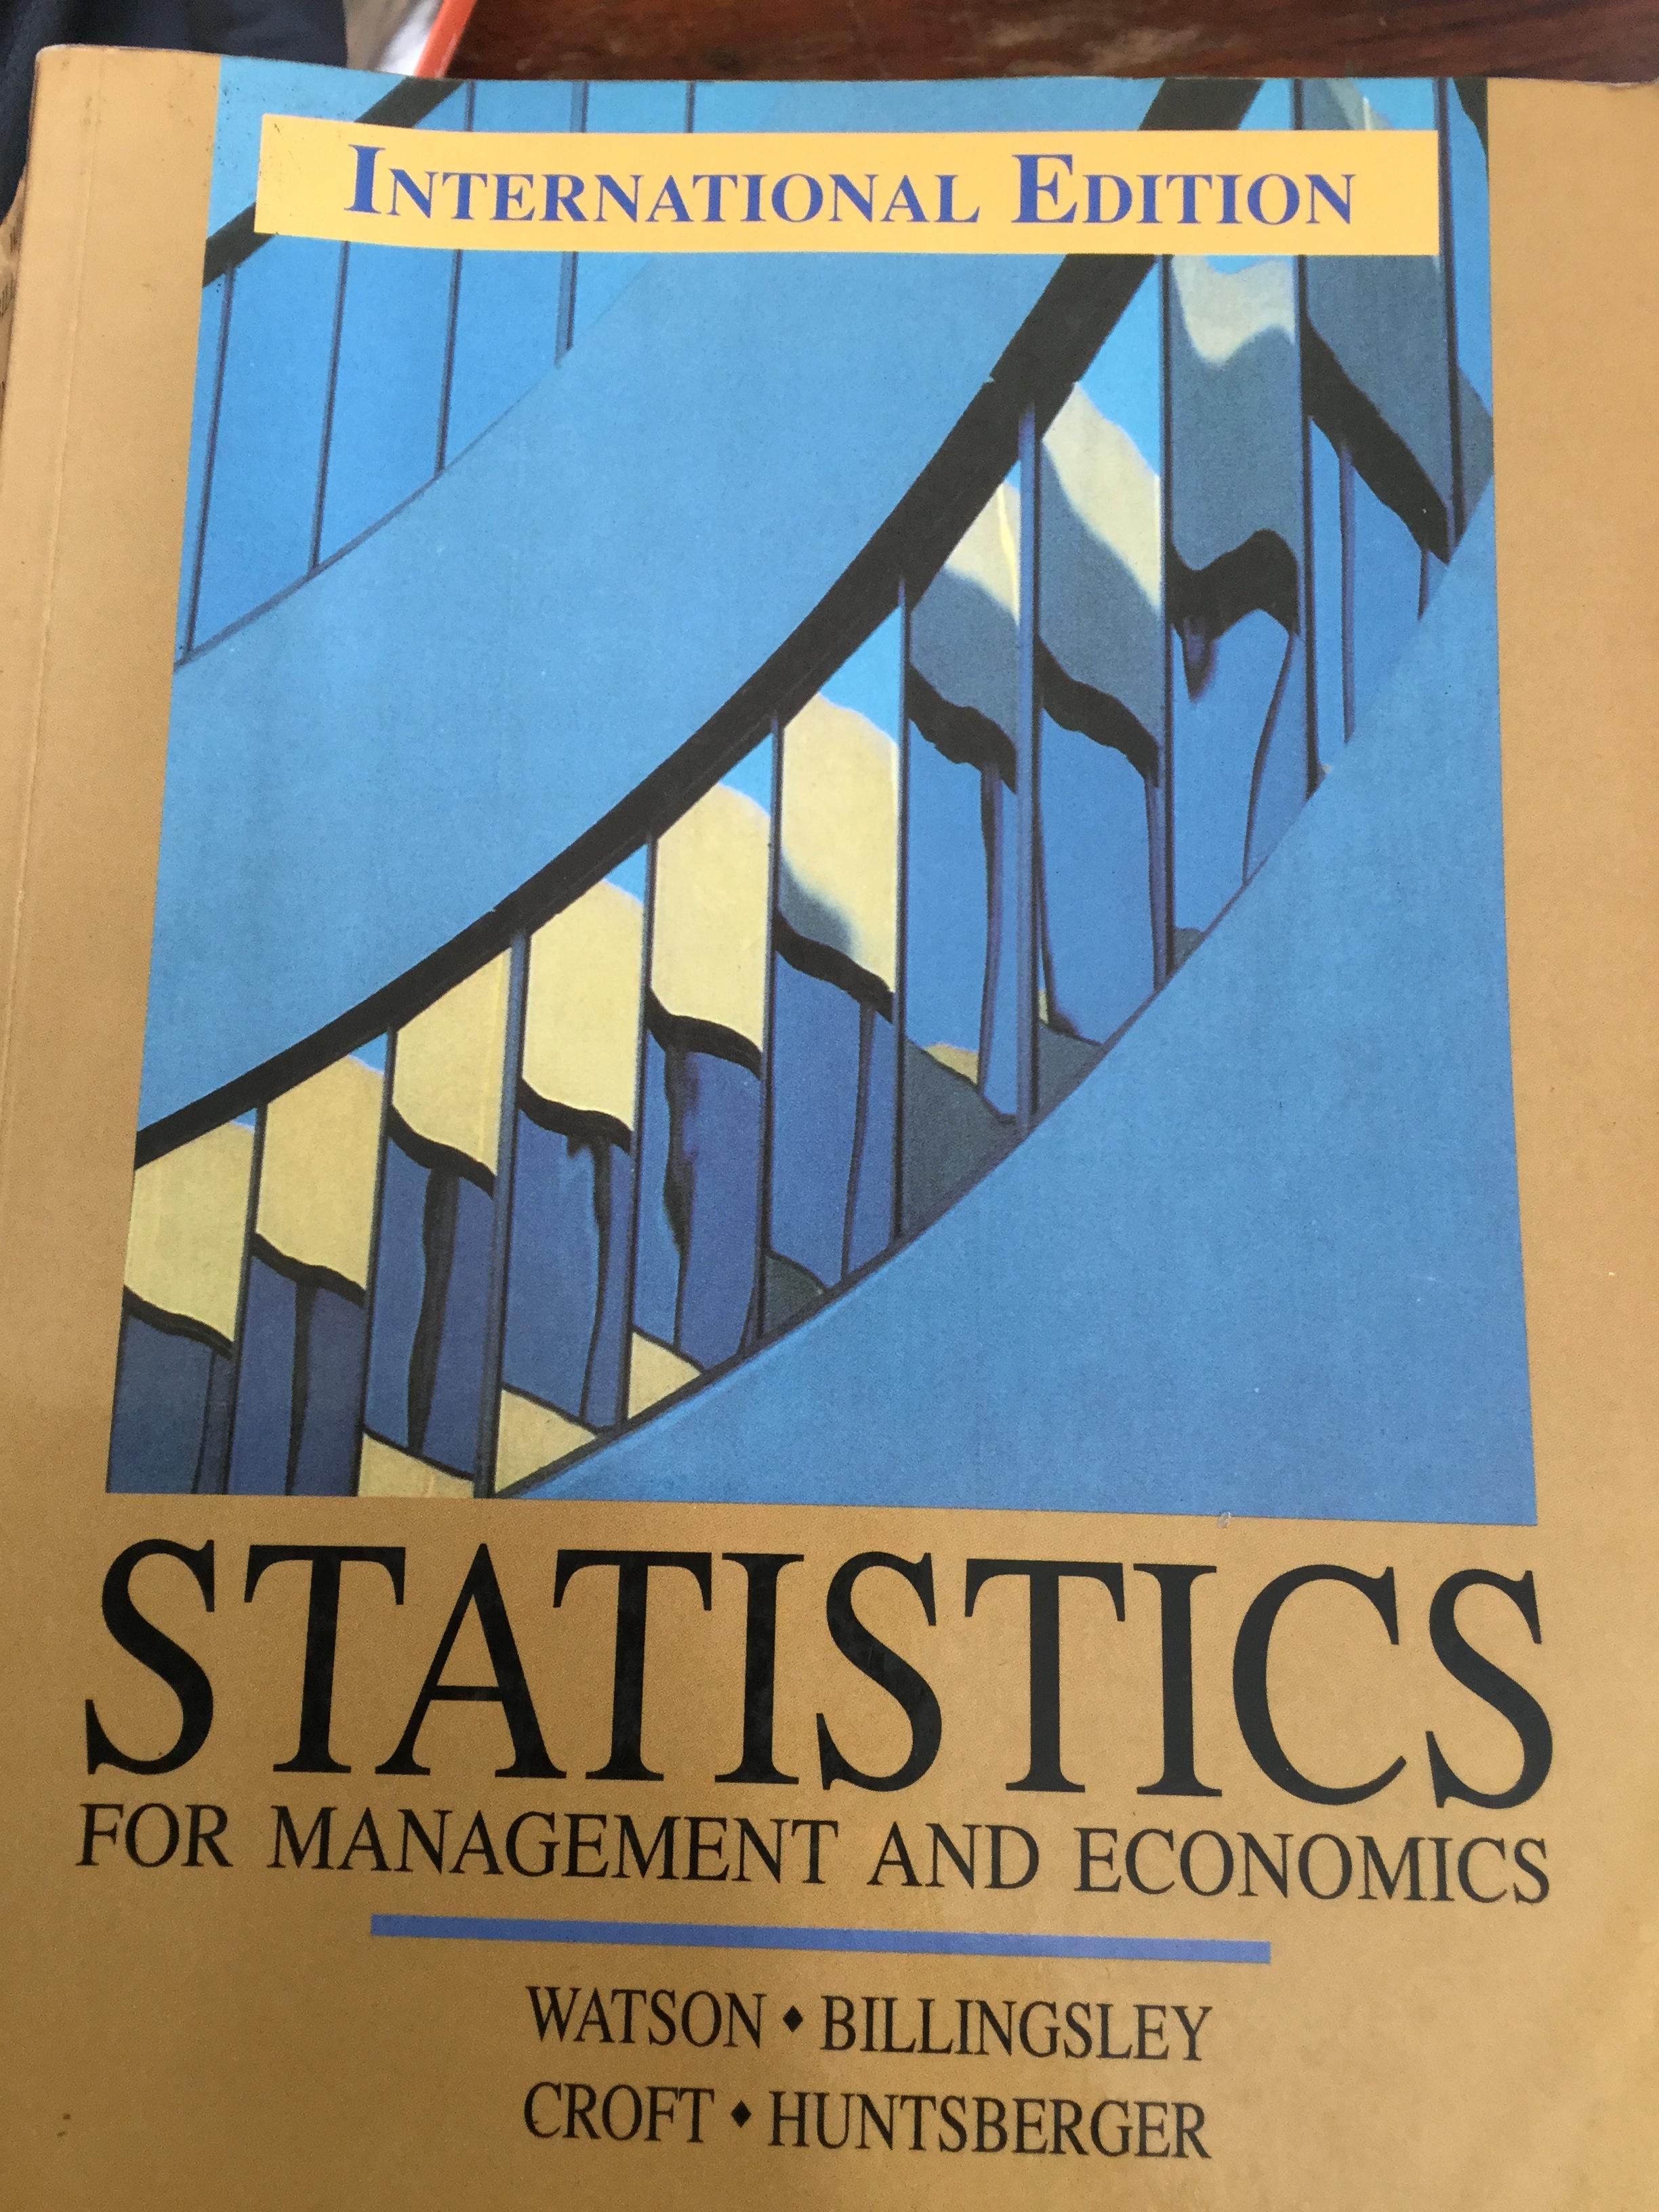 STATISTICS for Management and Economics.